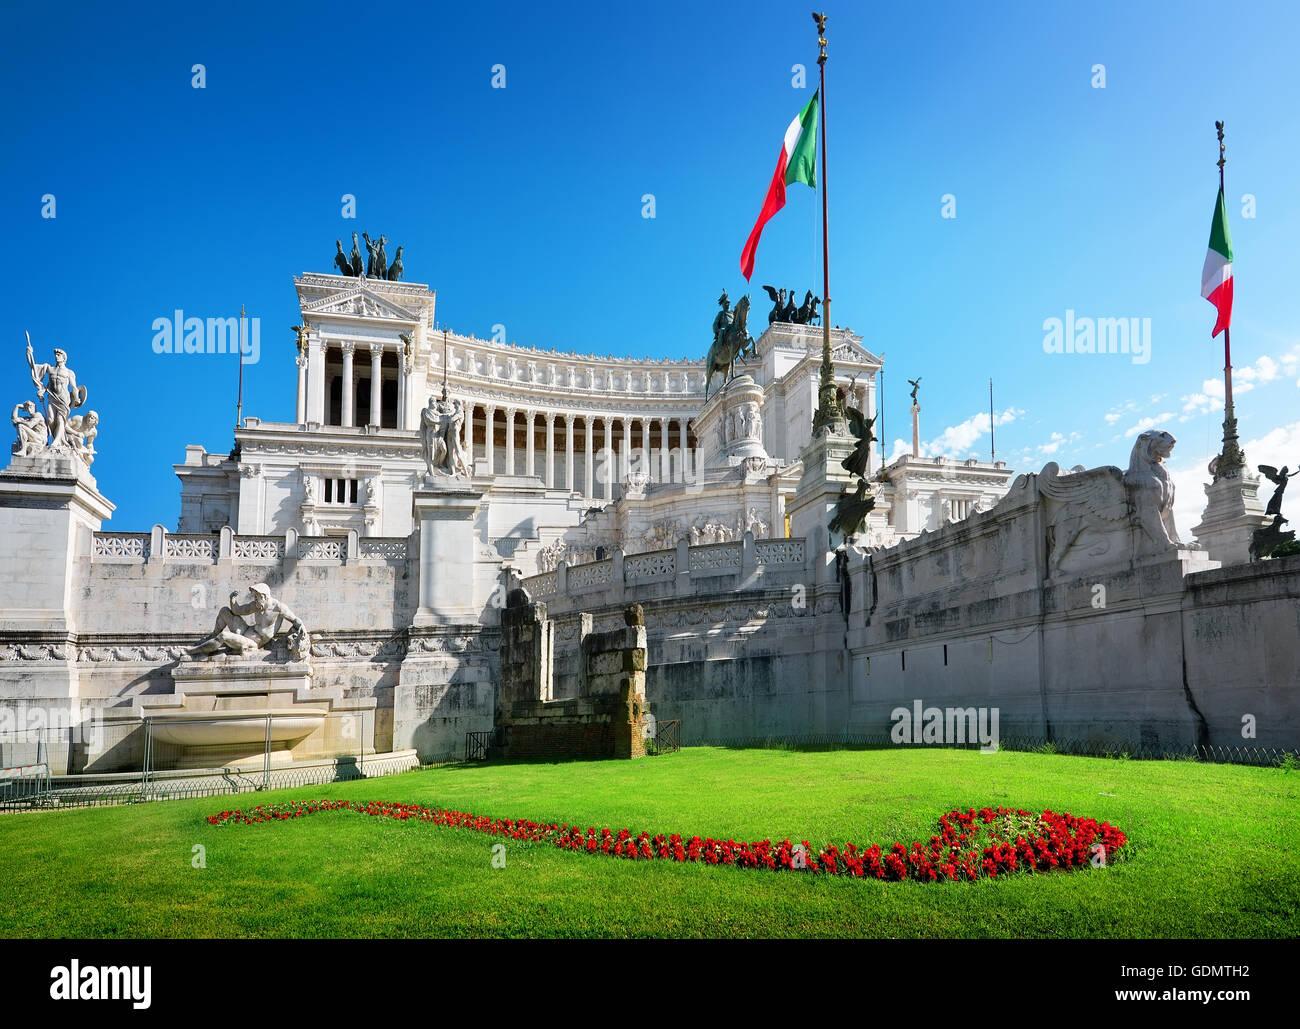 Monument à Piazza Venezia, Rome, Italie Photo Stock